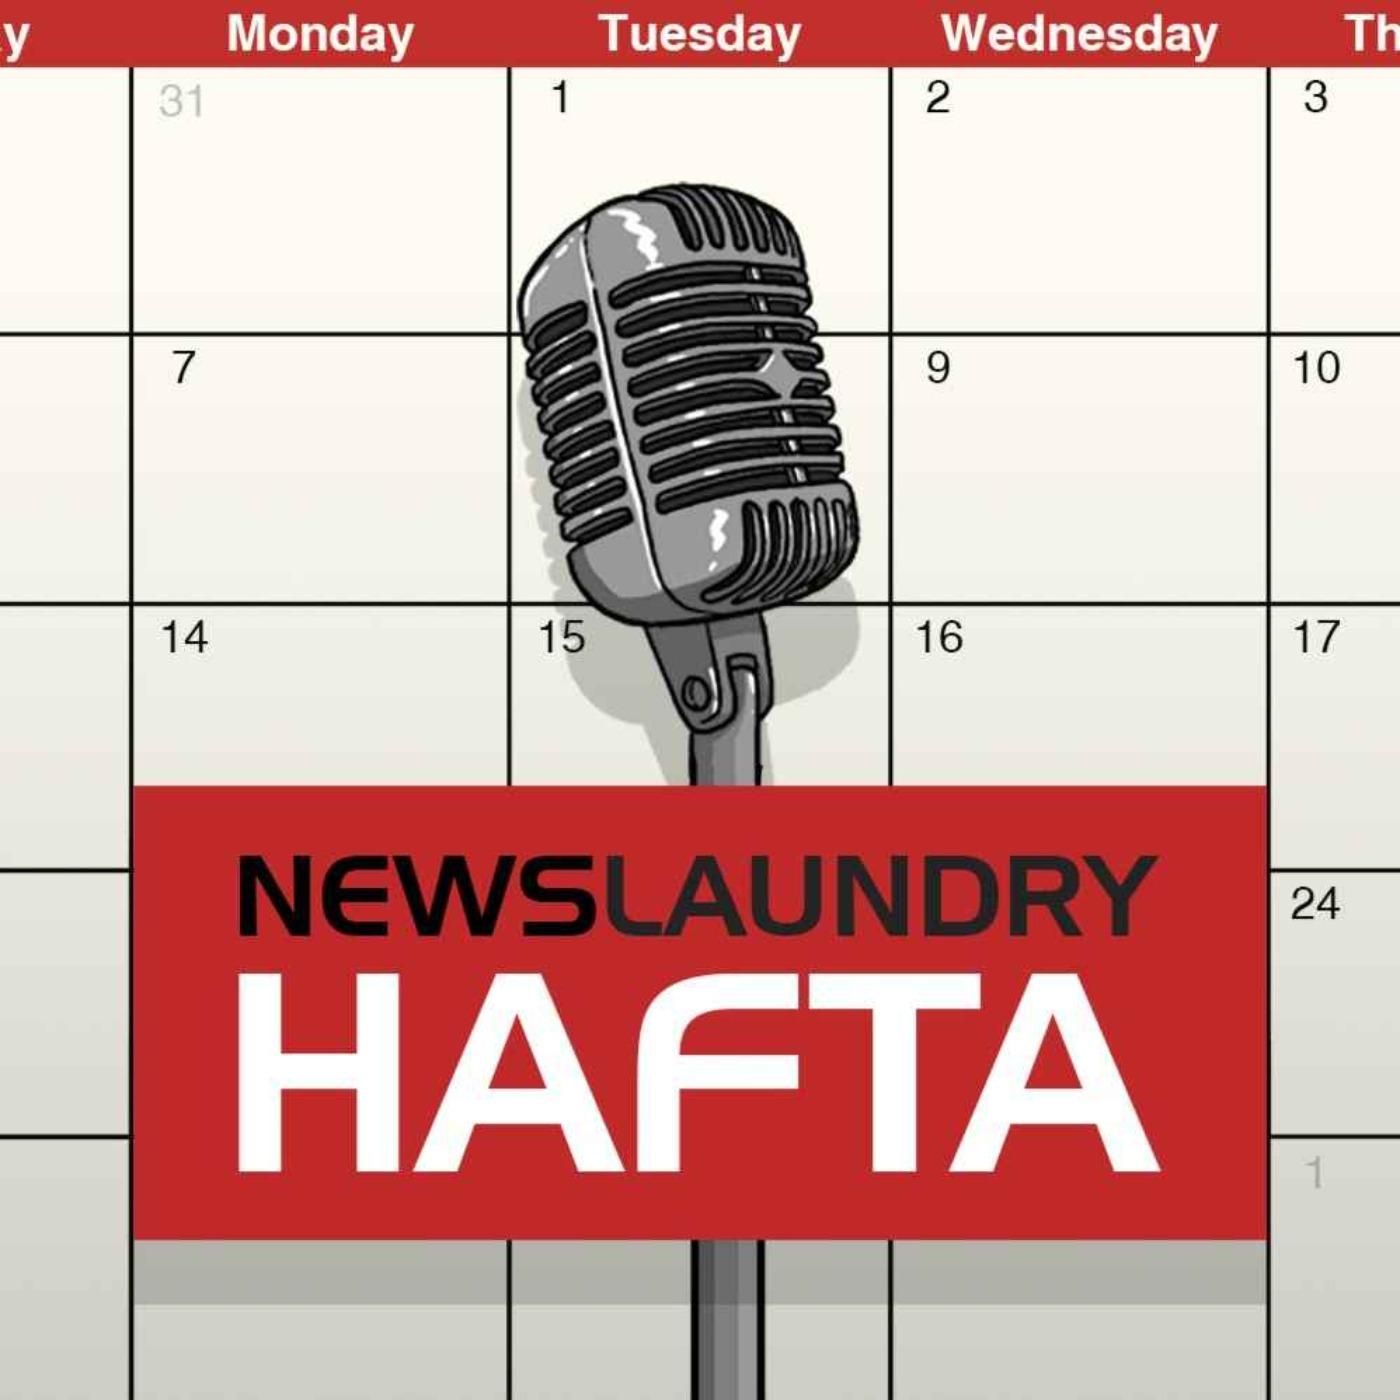 Chhota Hafta 313: Republic Day tractor rally, Rajdeep Sardesai taken off air, and Munawar Faruqui's bail